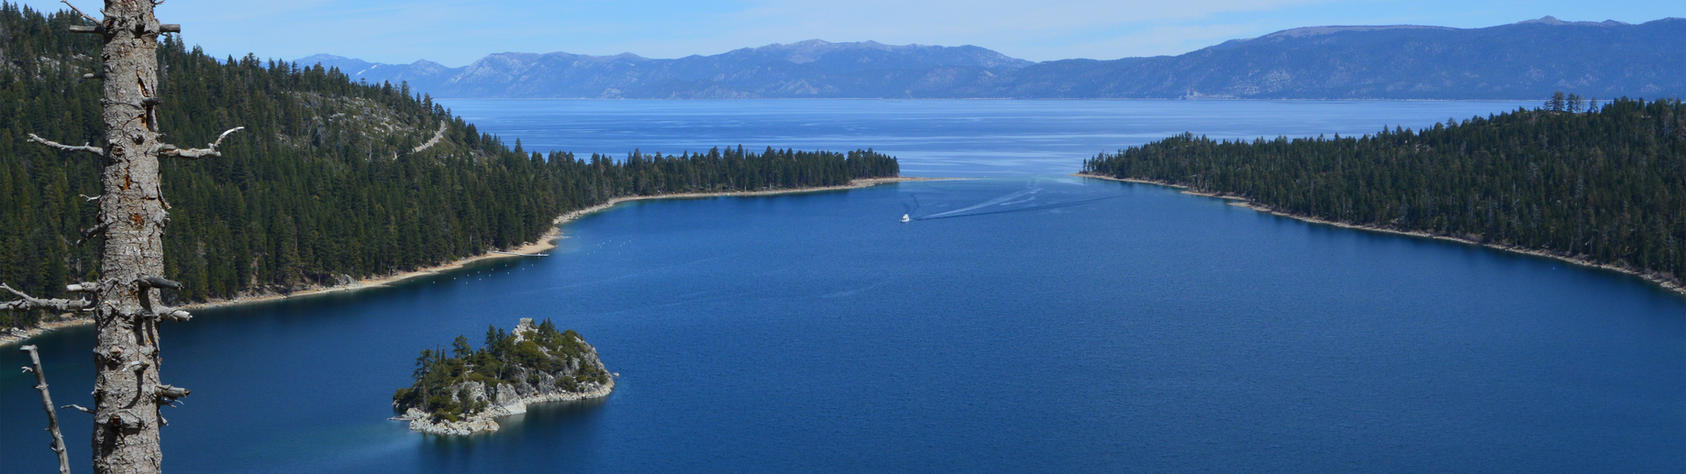 Lake Tahoe Emerald Bay by climber07